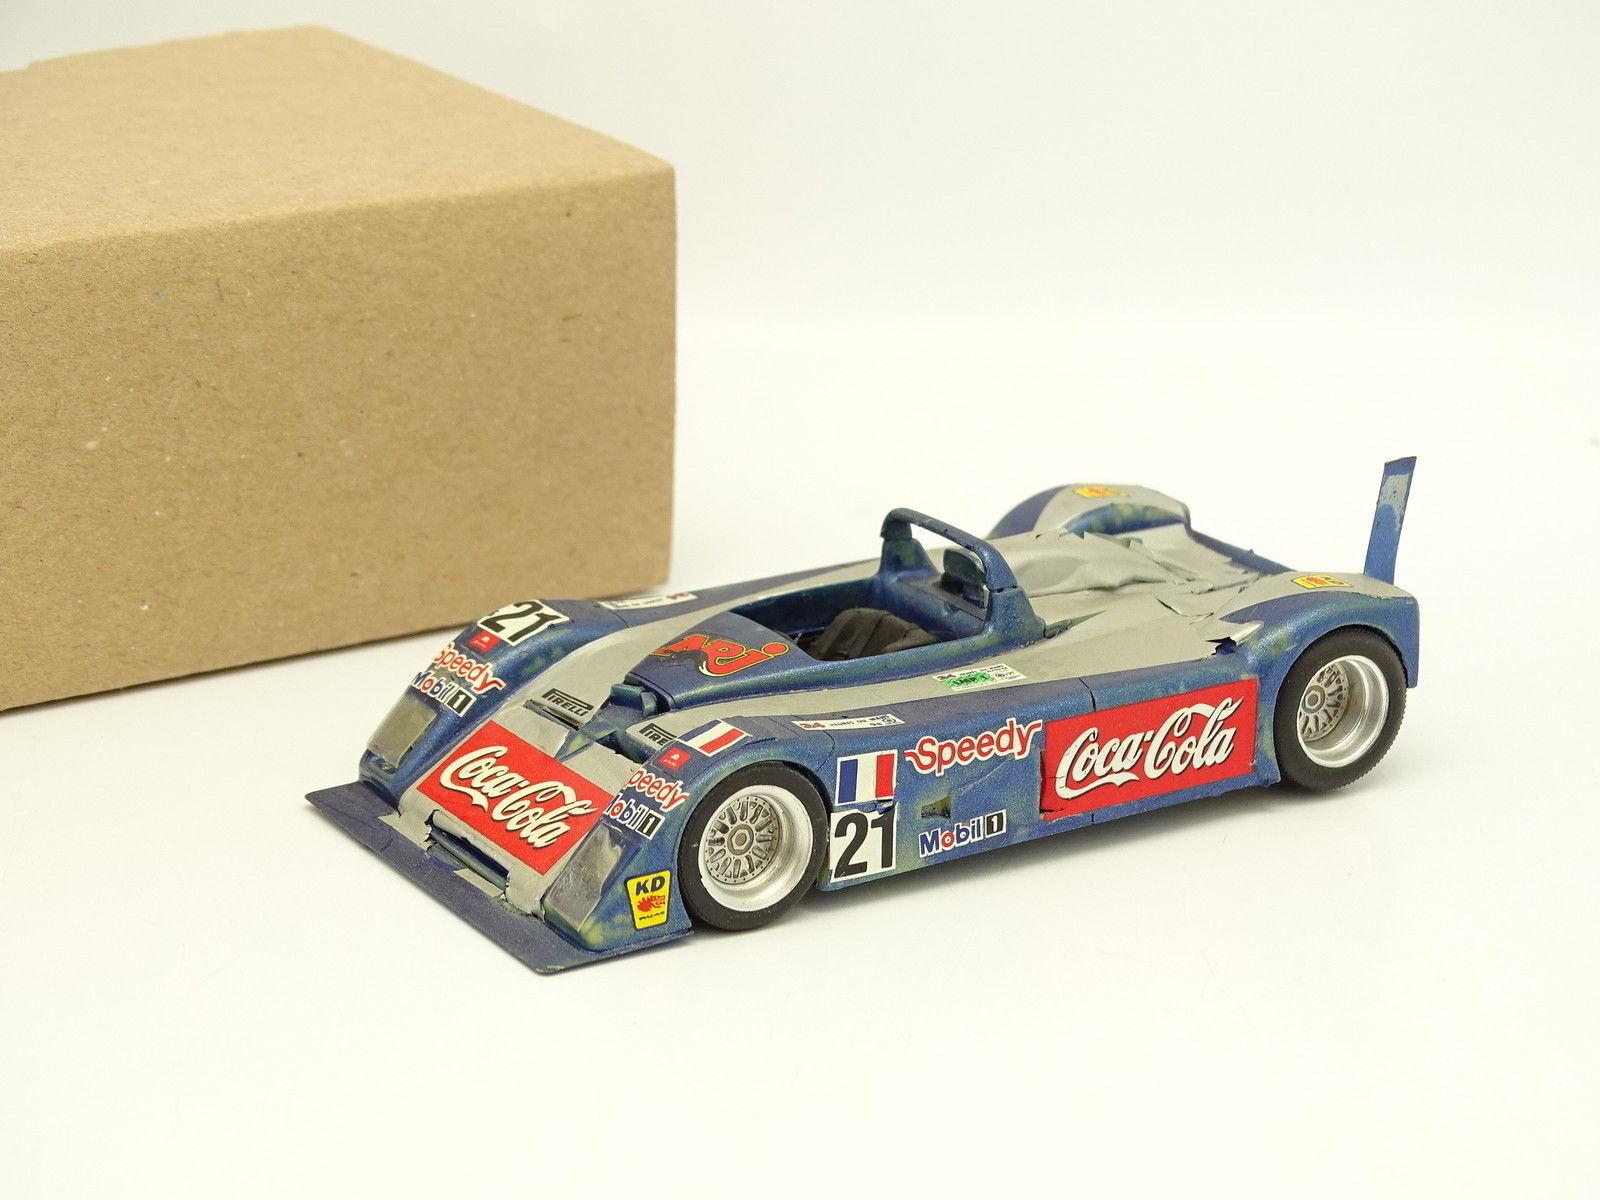 Provence Moulage Kit Montado Sb 1 1 1 43 - R&s Oldsmobile Le Mans 1998 bc2116